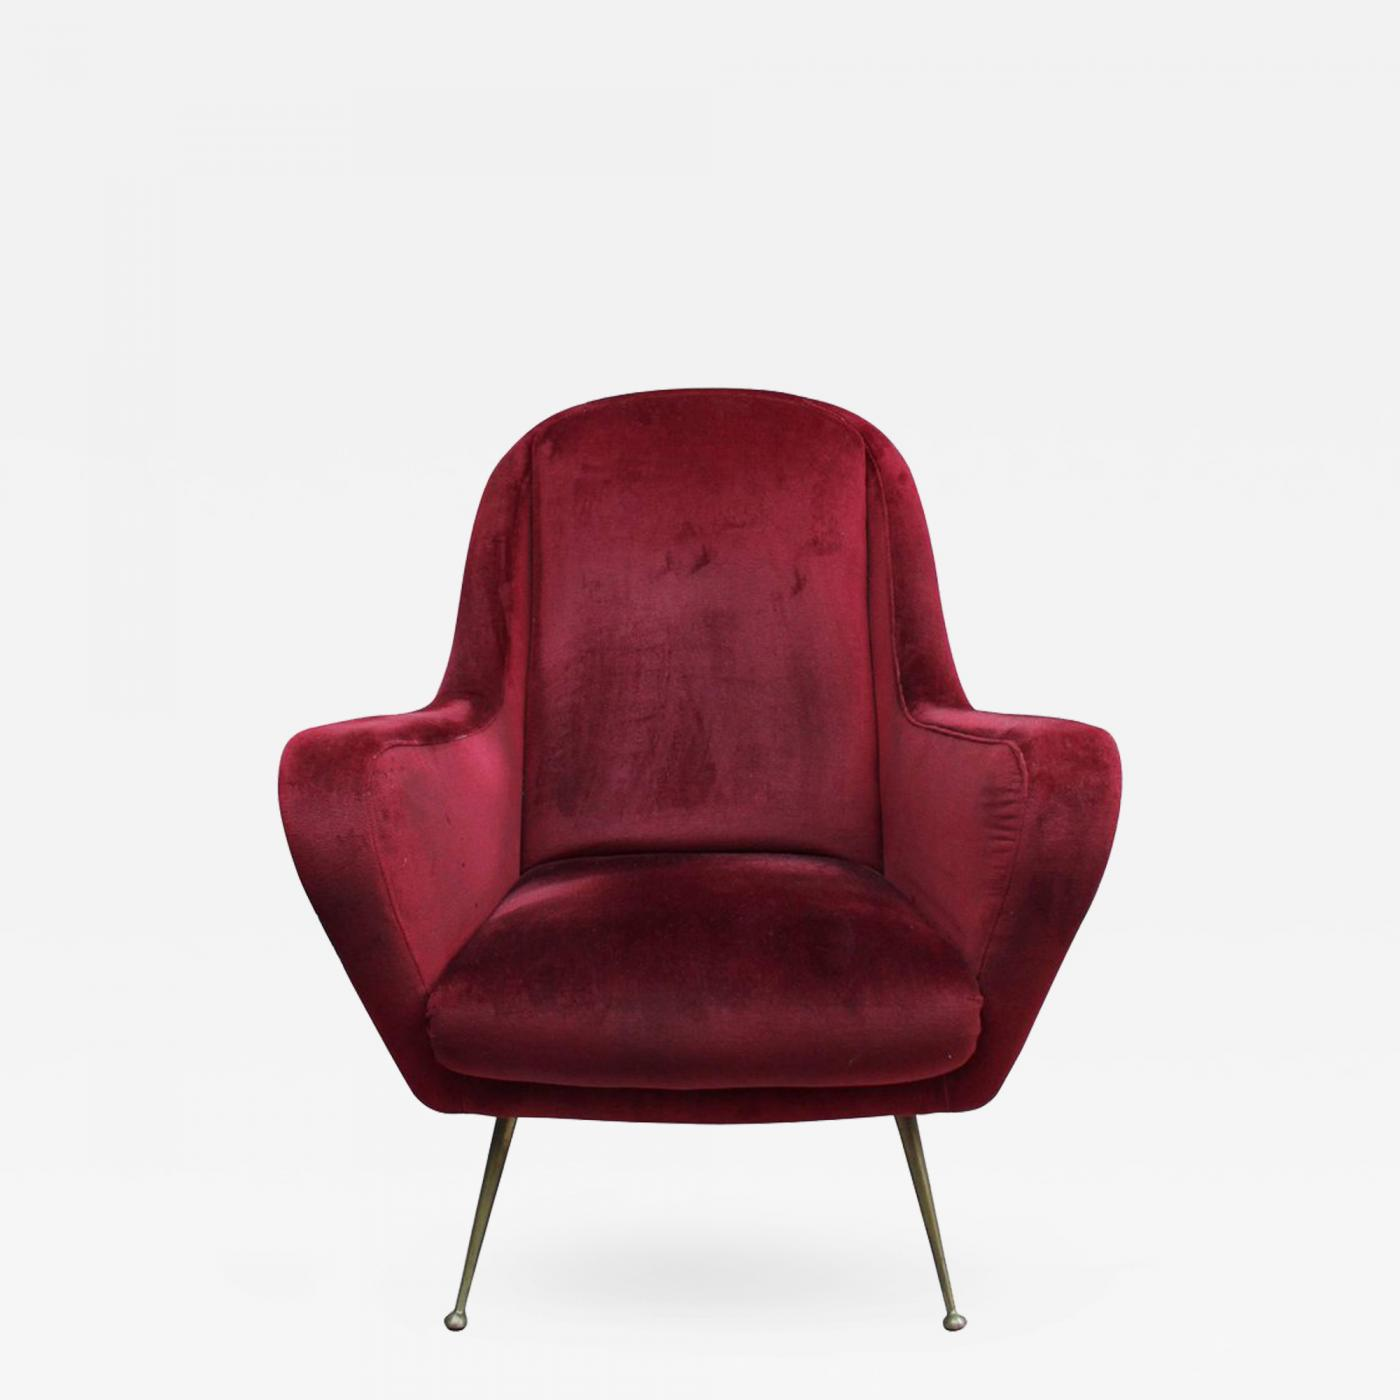 Phenomenal A Fine 1970S Italian Red Velvet Armchair With Brass Legs Theyellowbook Wood Chair Design Ideas Theyellowbookinfo